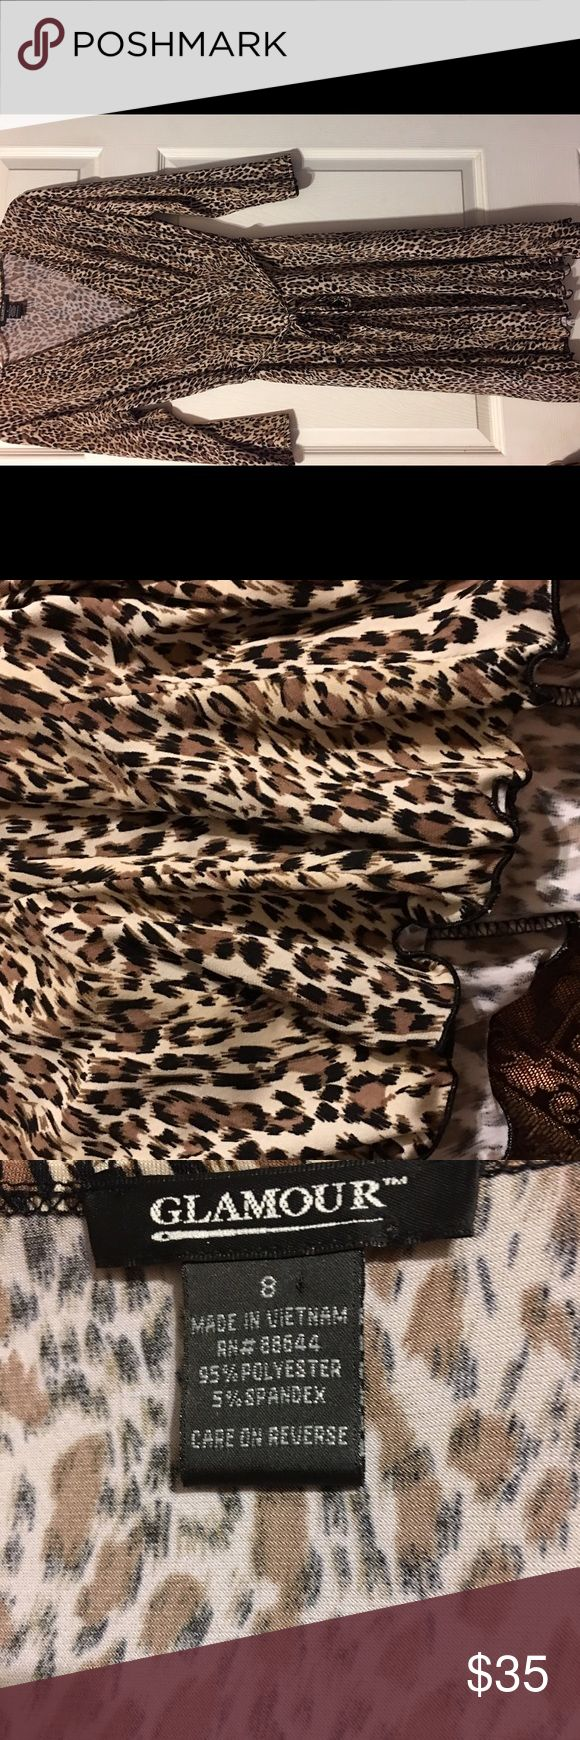 Glamorous Cheetah print dress Stretchy, ruffle bottom Cheetah print dress with matching belt Glamorise Dresses